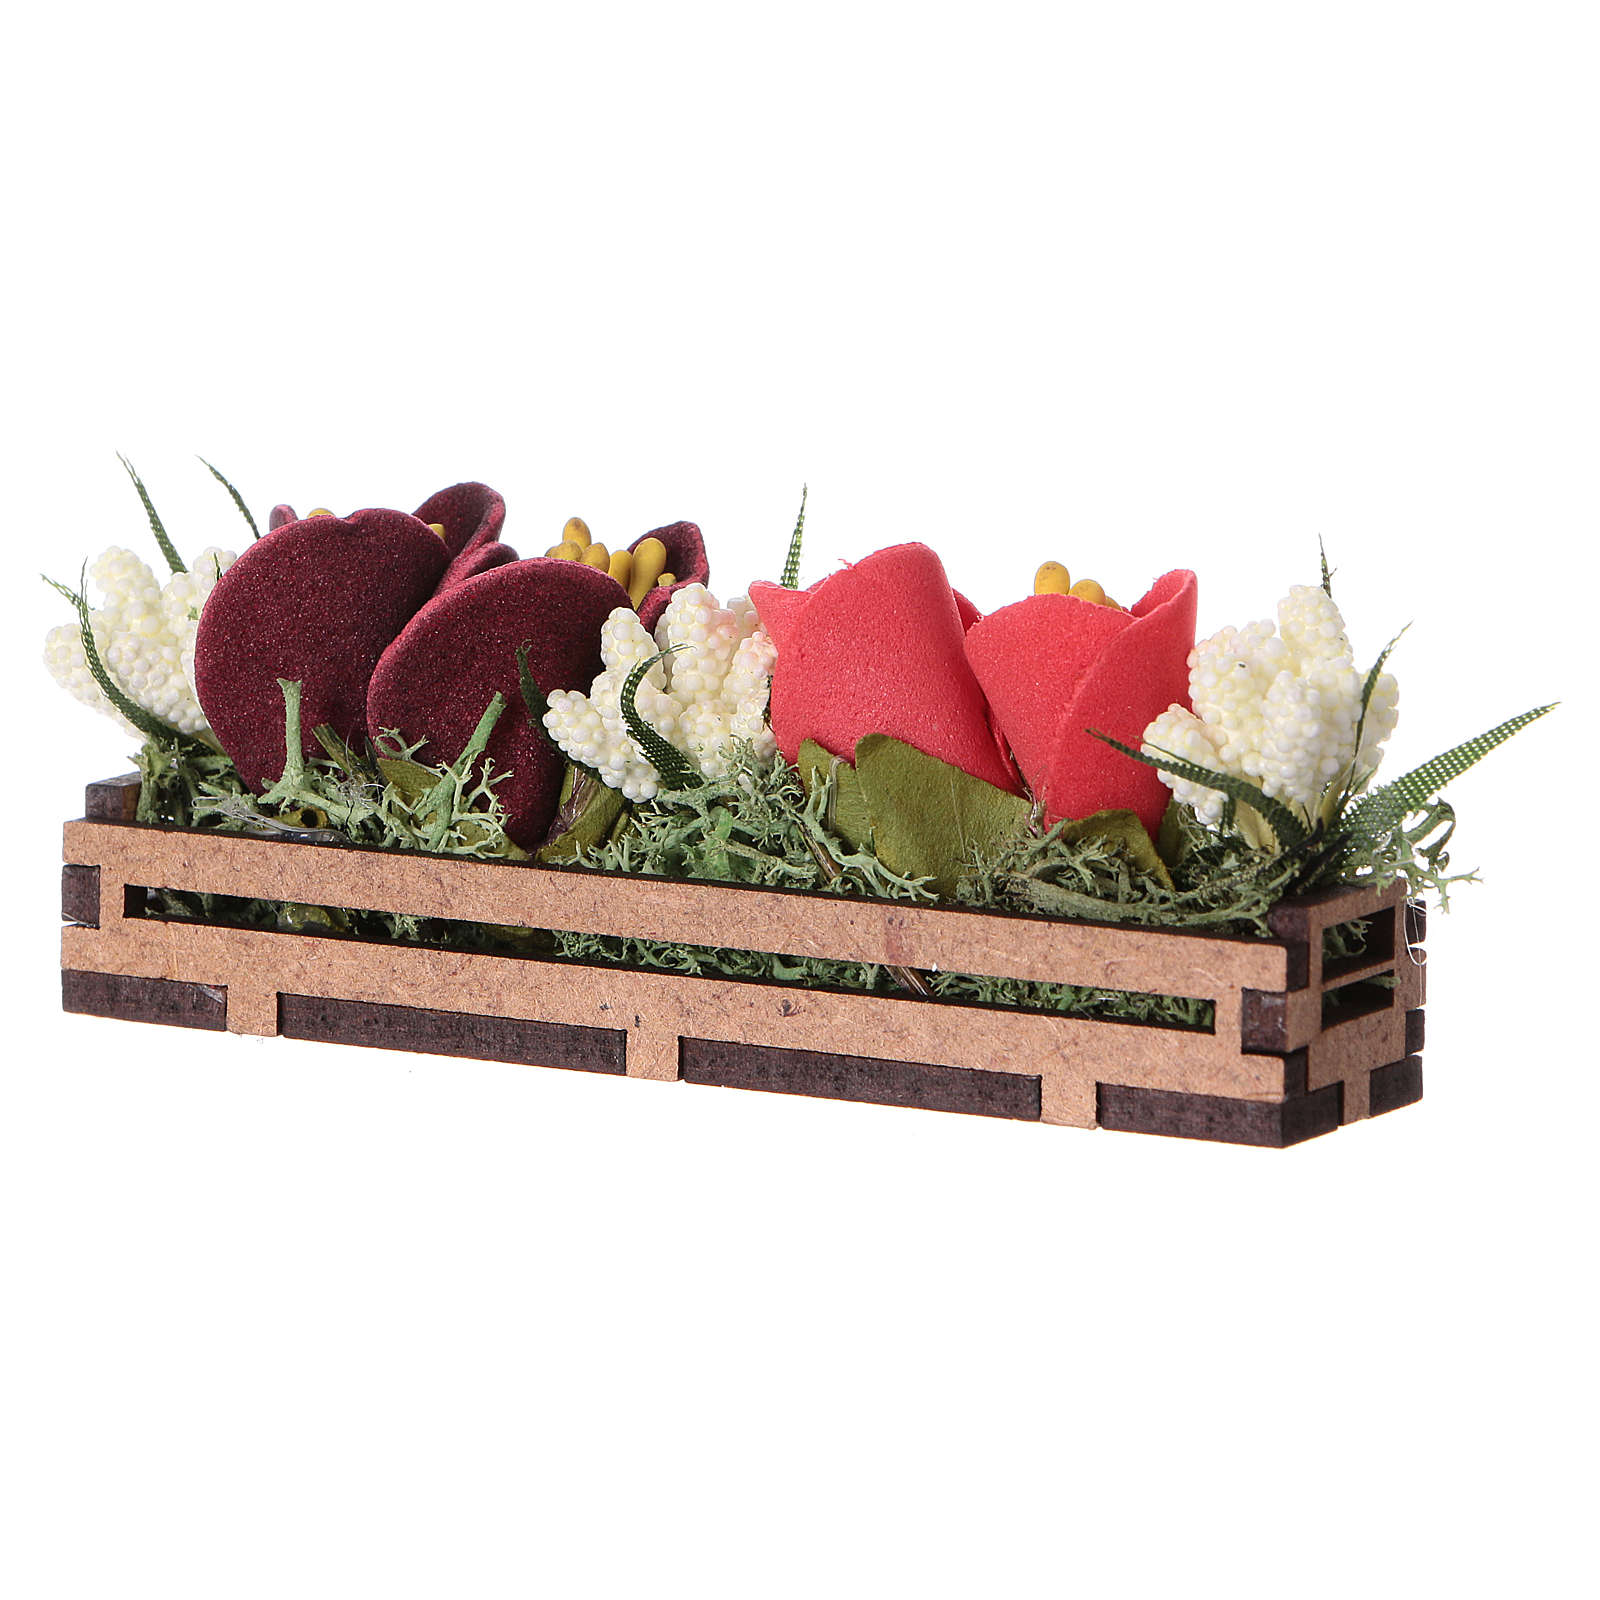 Bac à fleurs en bois 5x10x5 cm 4